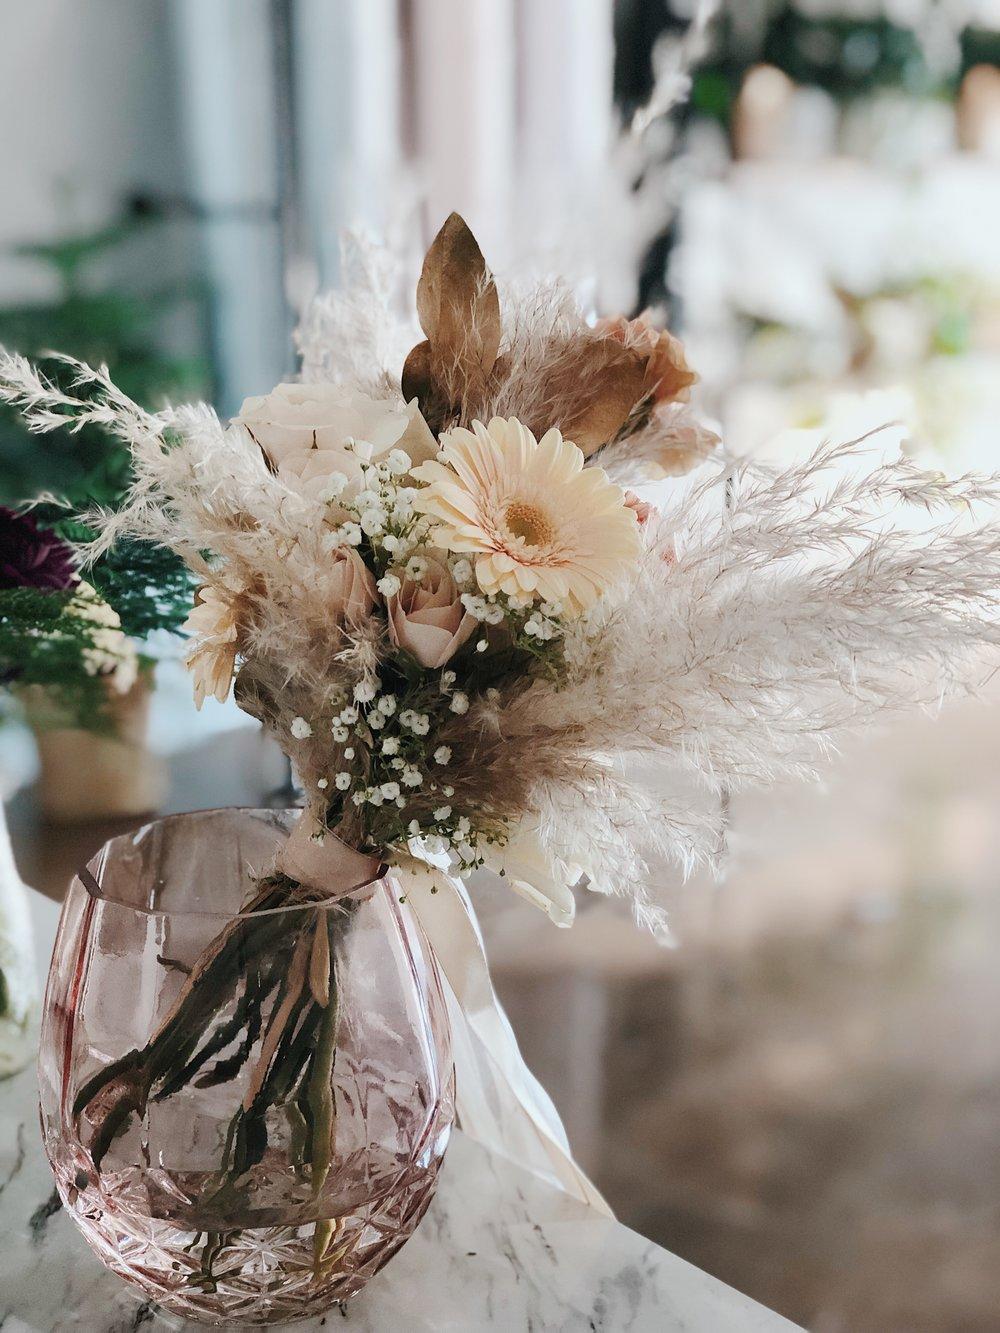 Flowers by Eva M Flowerscence Flower Studio